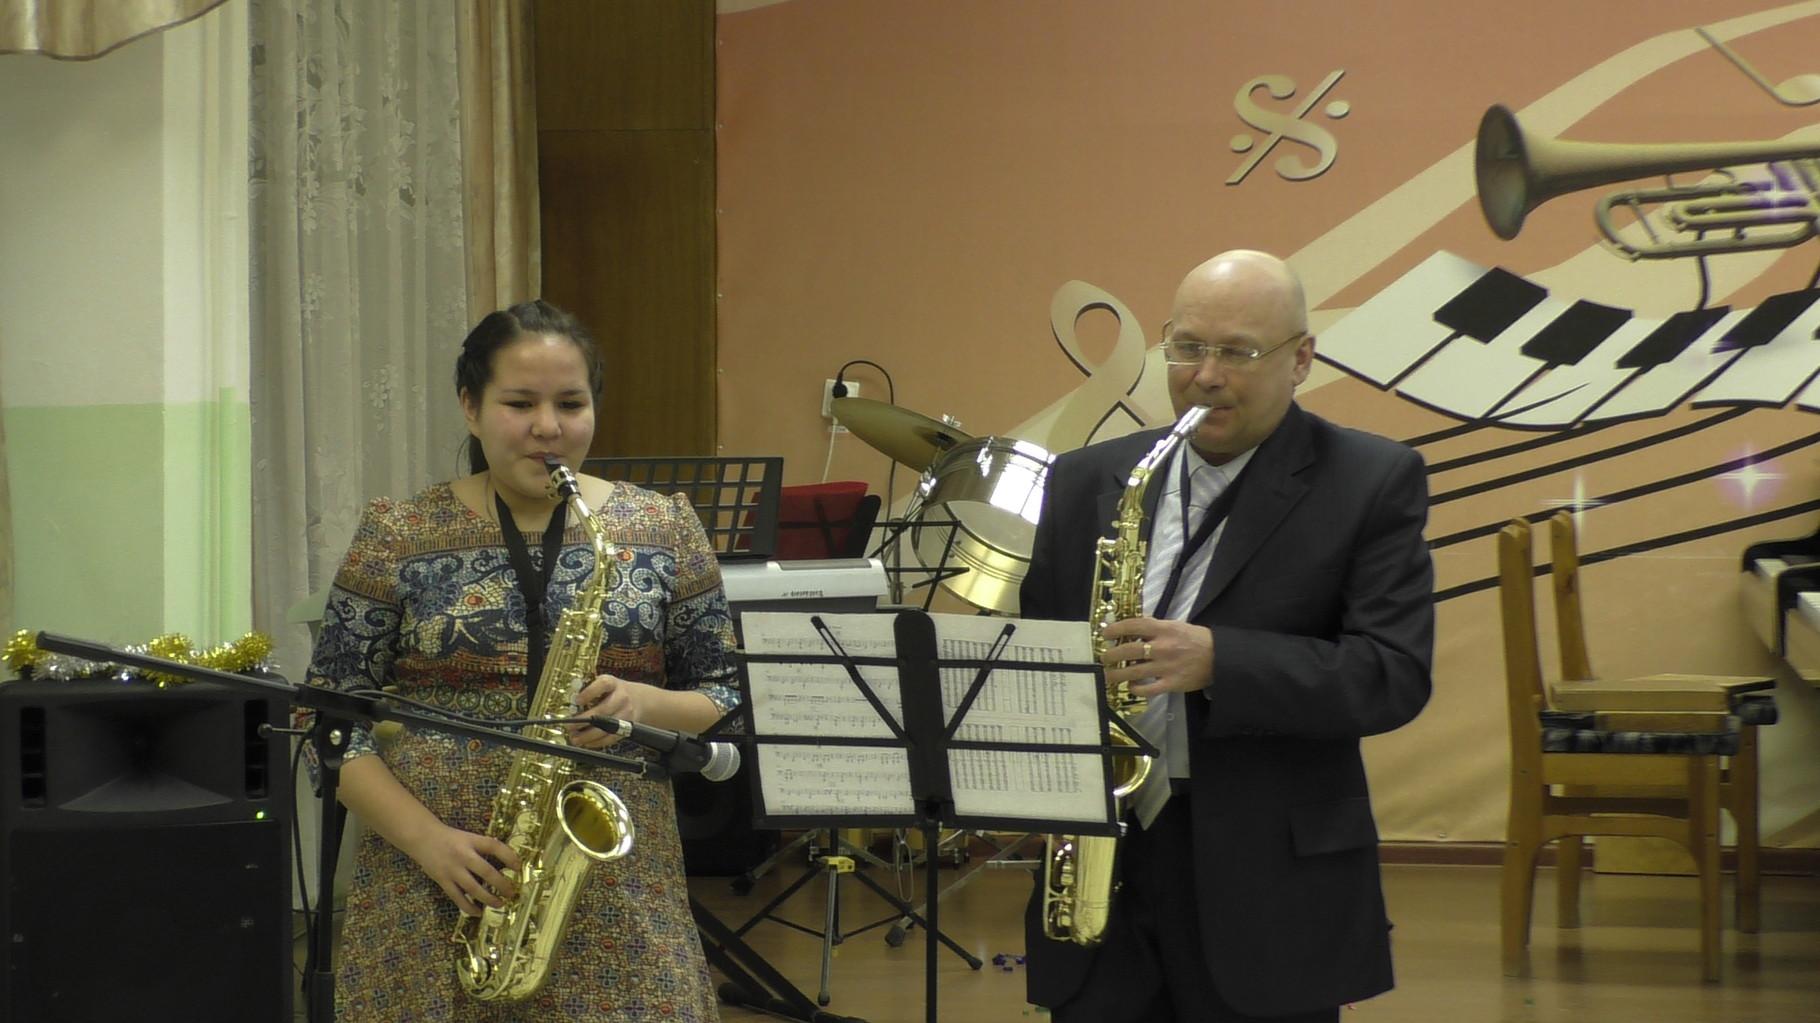 Дуэт саксофонистов: Кунакбаева Л. и Петухов С.В.